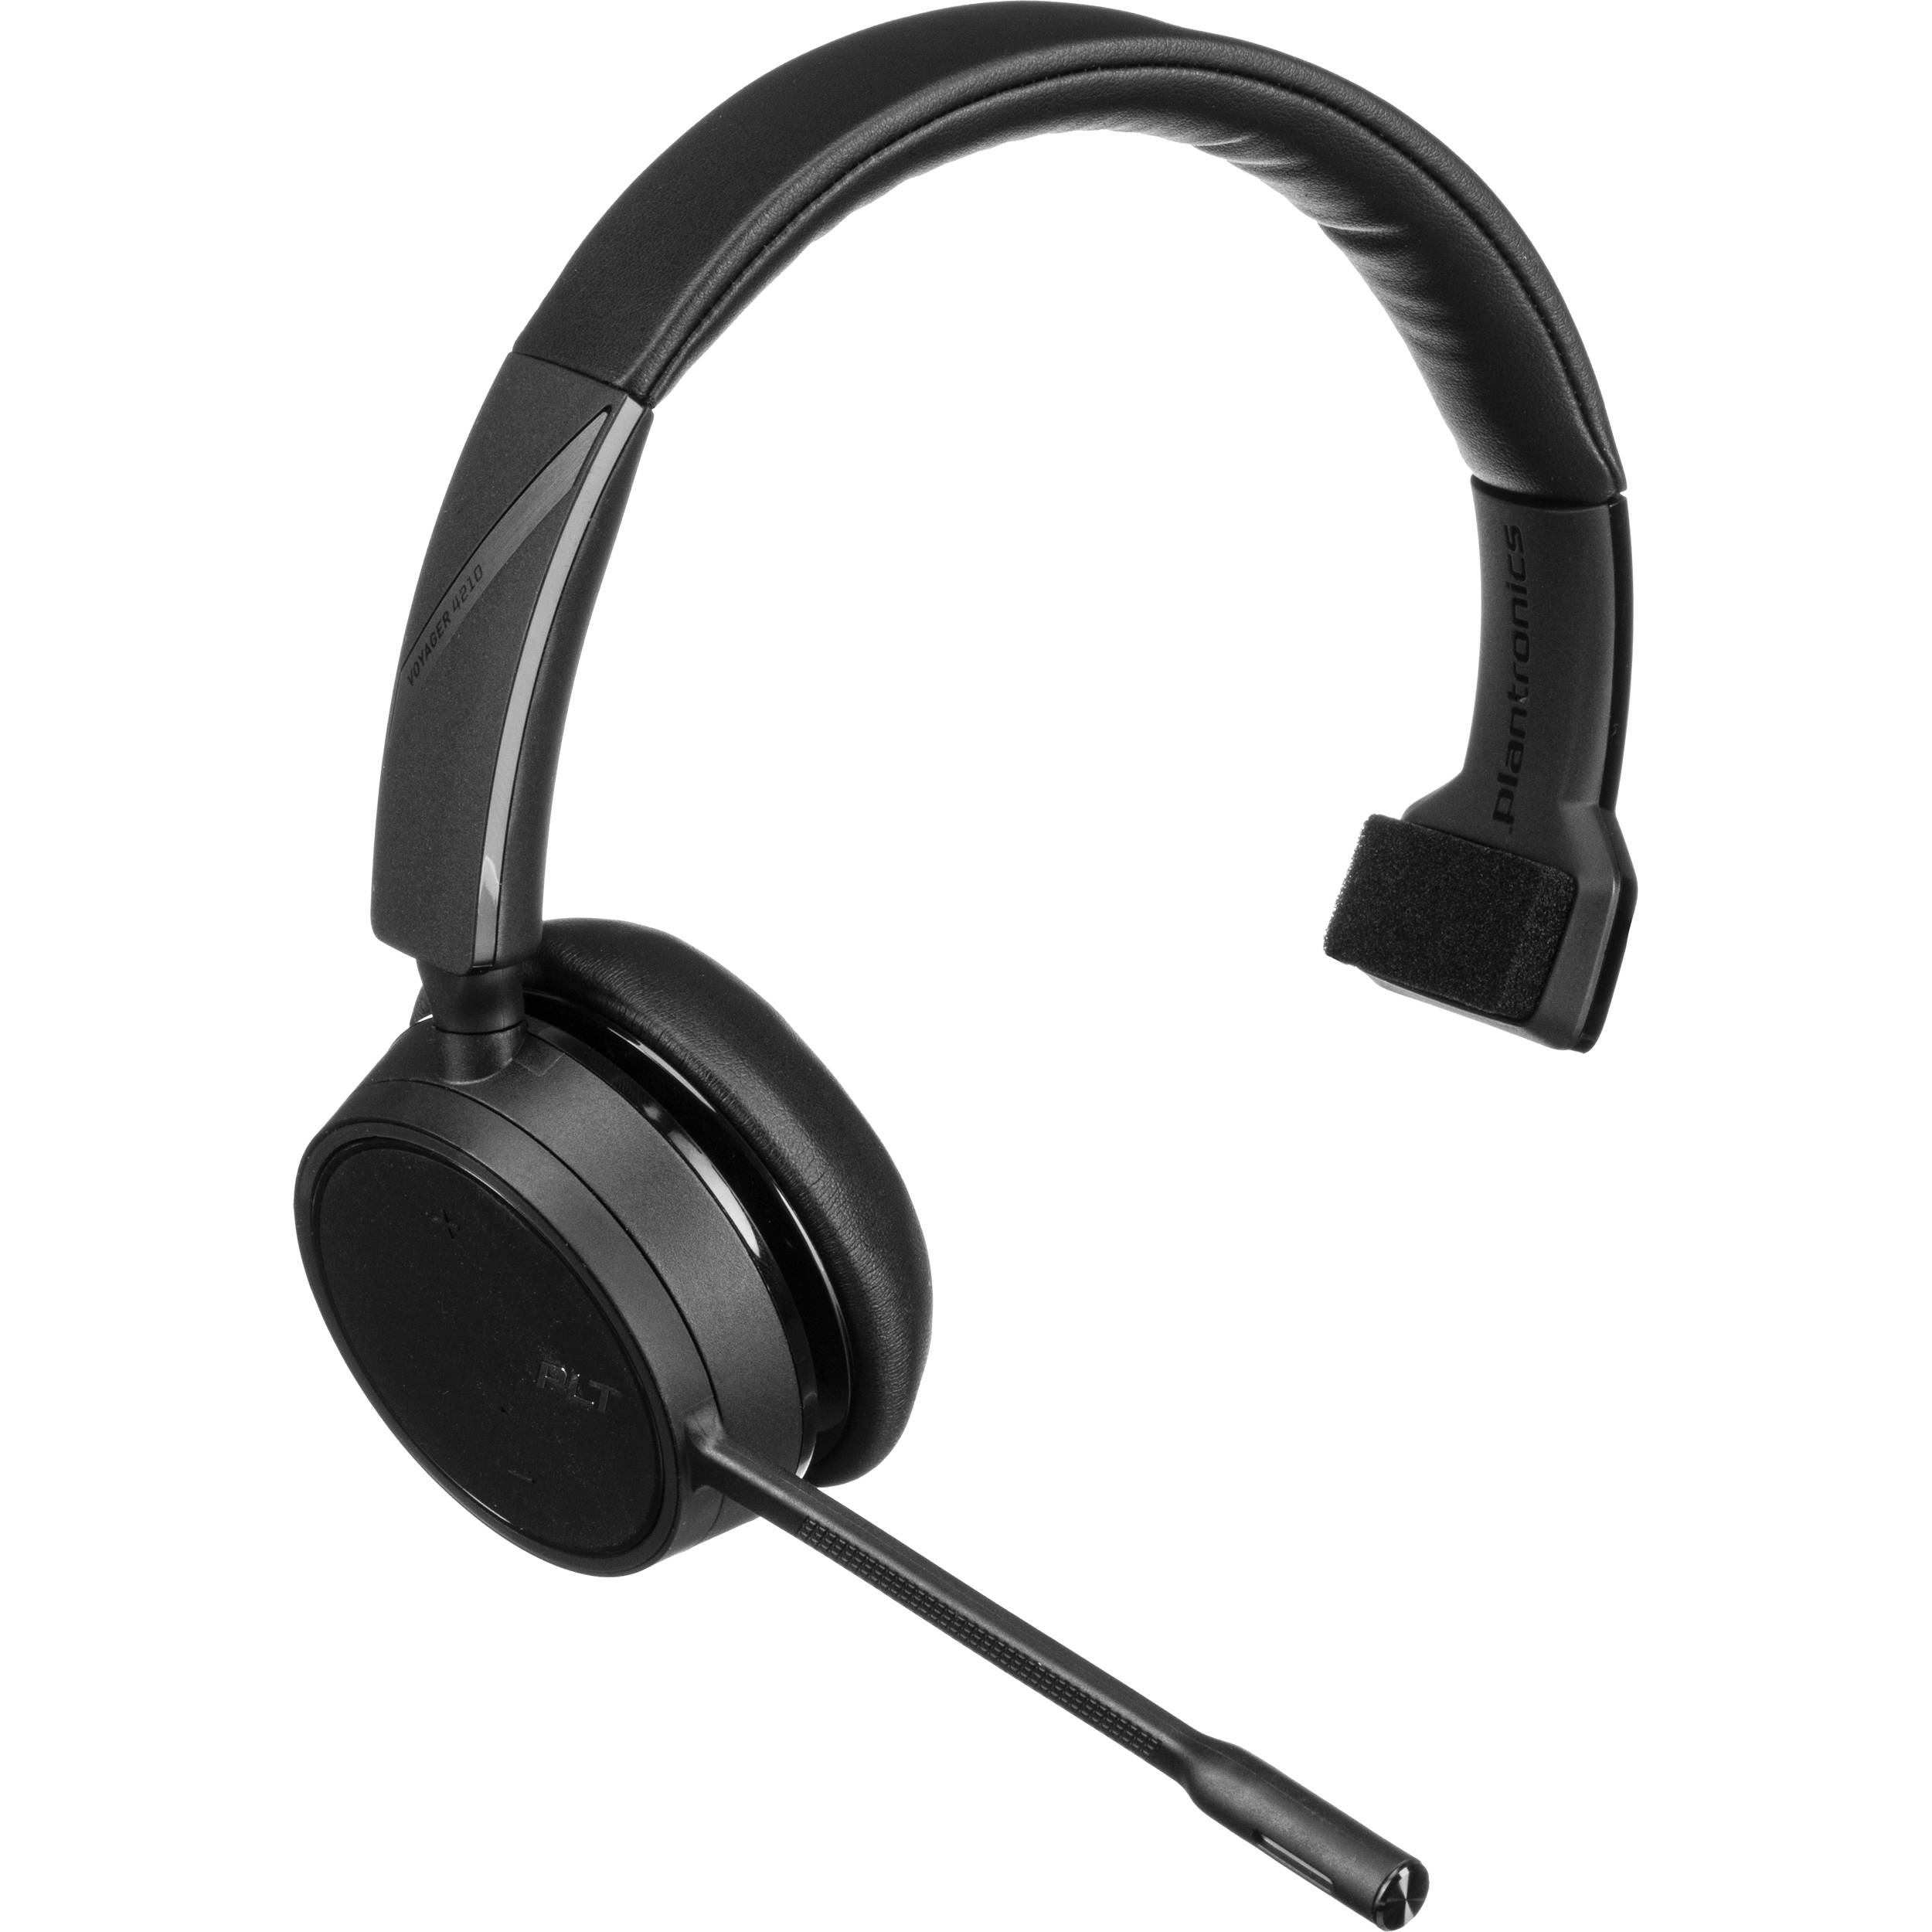 Plantronics Voyager Monaural 4210 Uc Bluetooth Headset